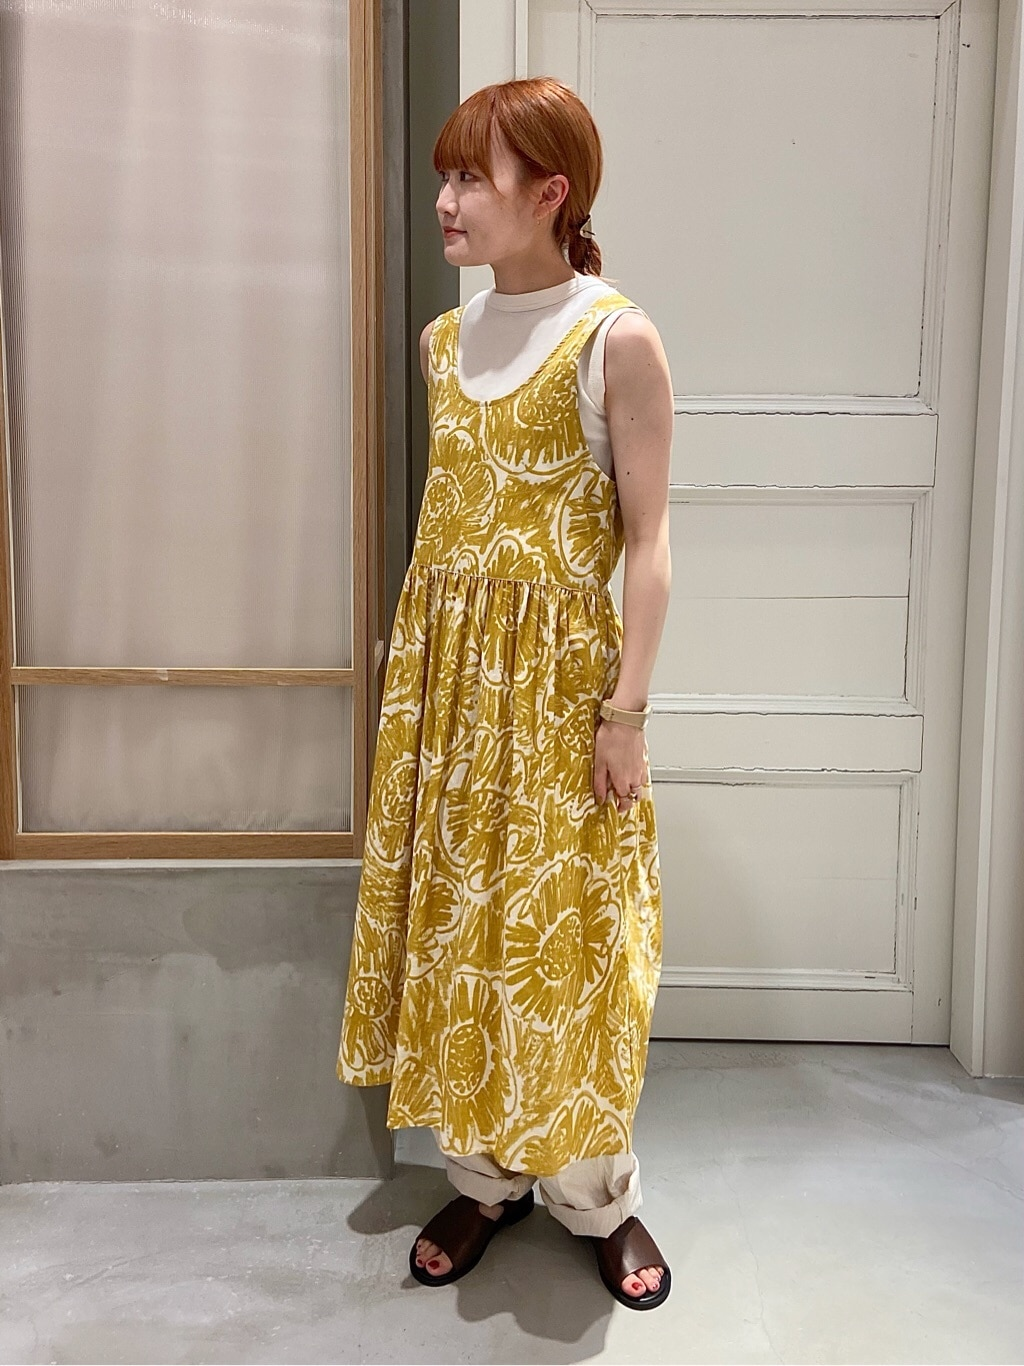 bulle de savon 渋谷スクランブルスクエア 身長:160cm 2021.05.29